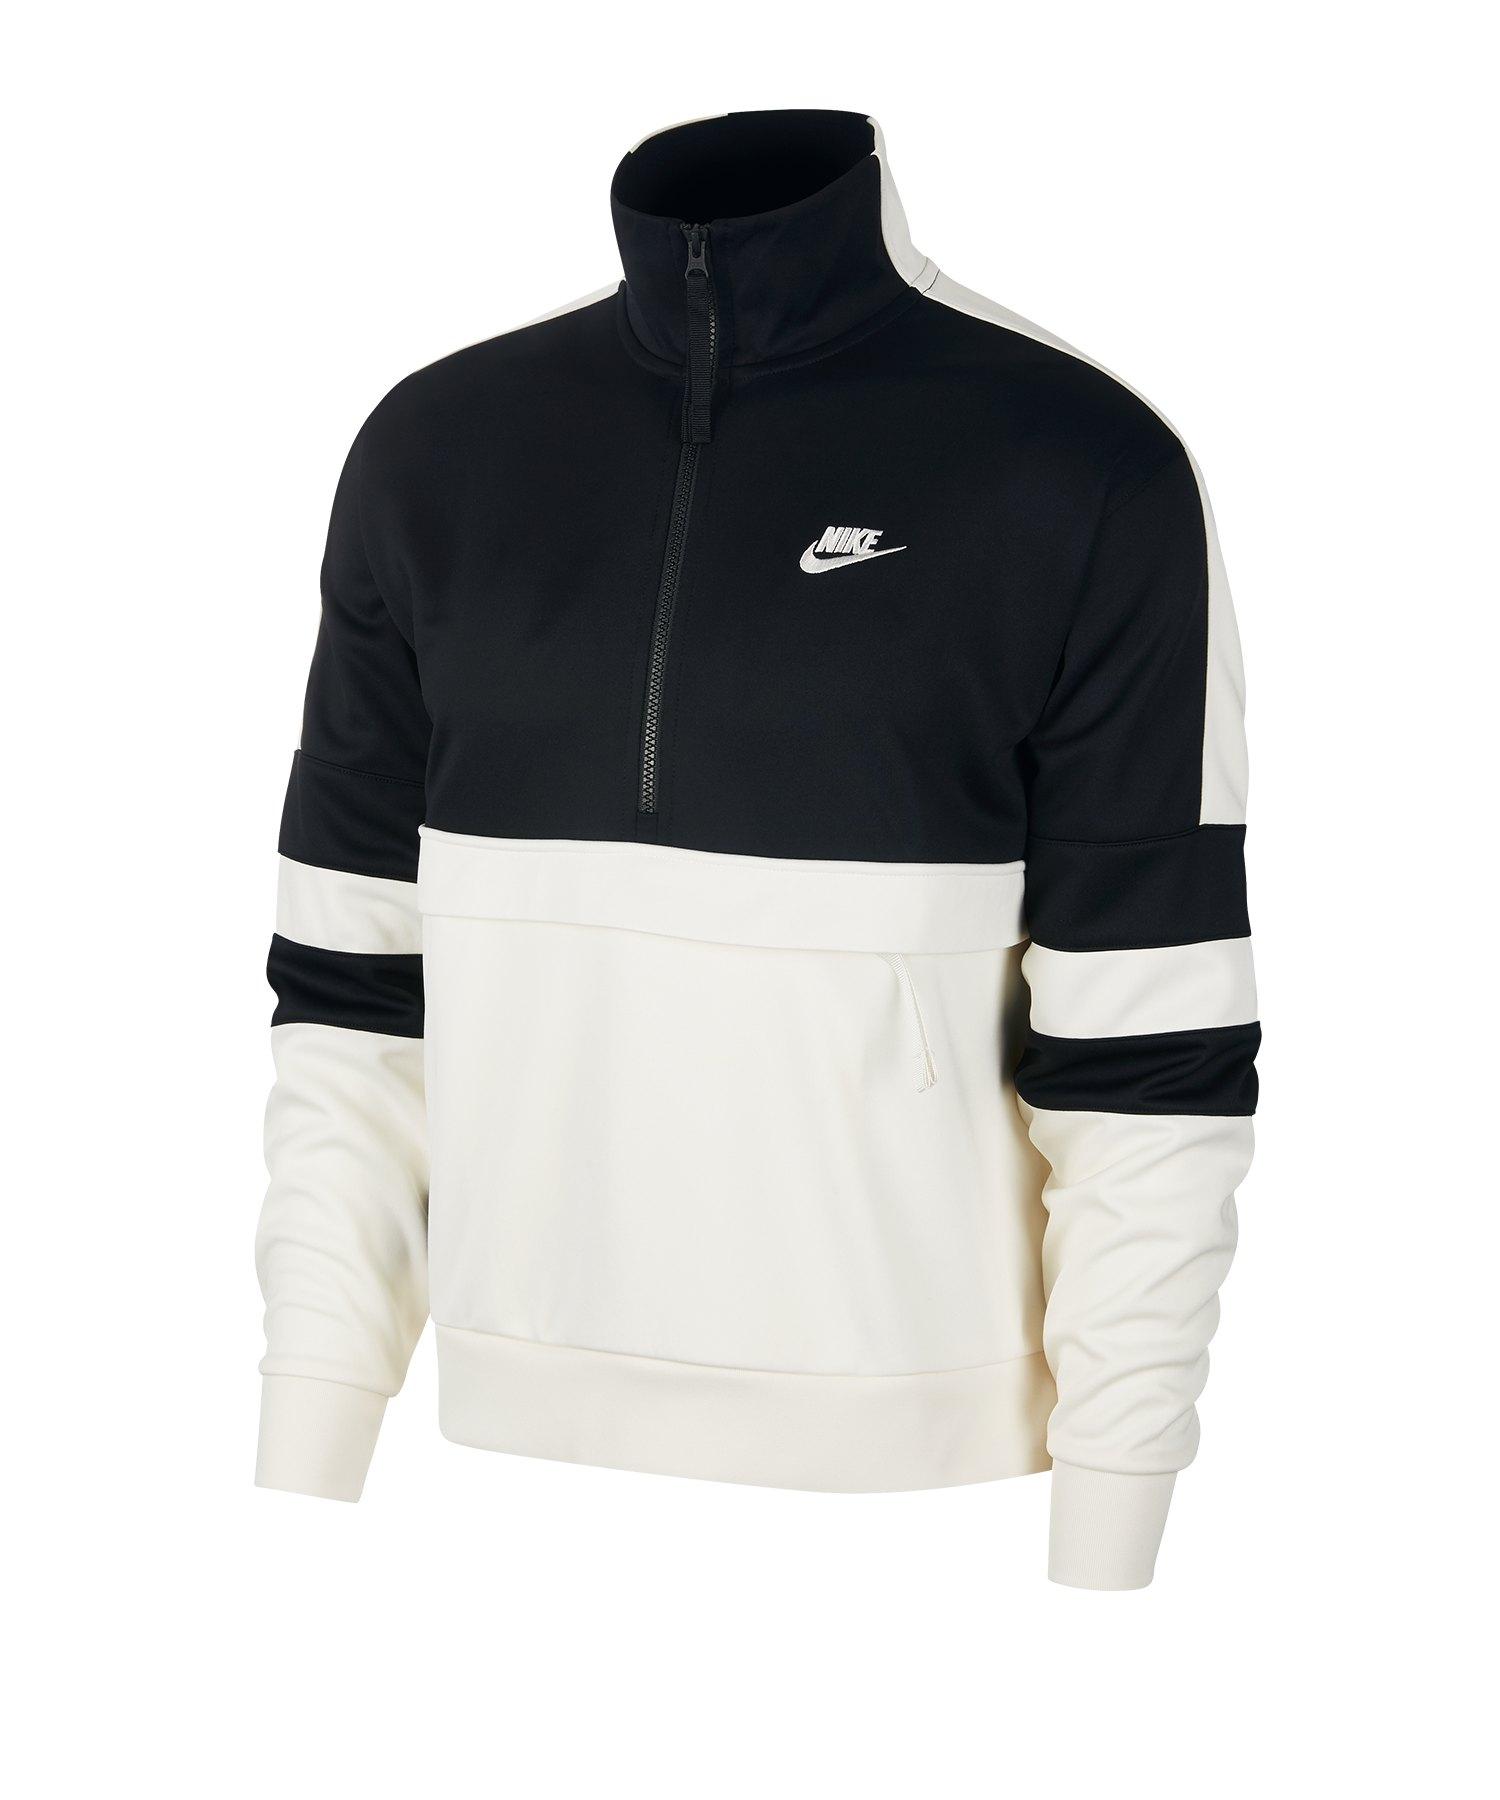 Nike Air Sweatshirt 1/4 Zip Schwarz F010 - schwarz